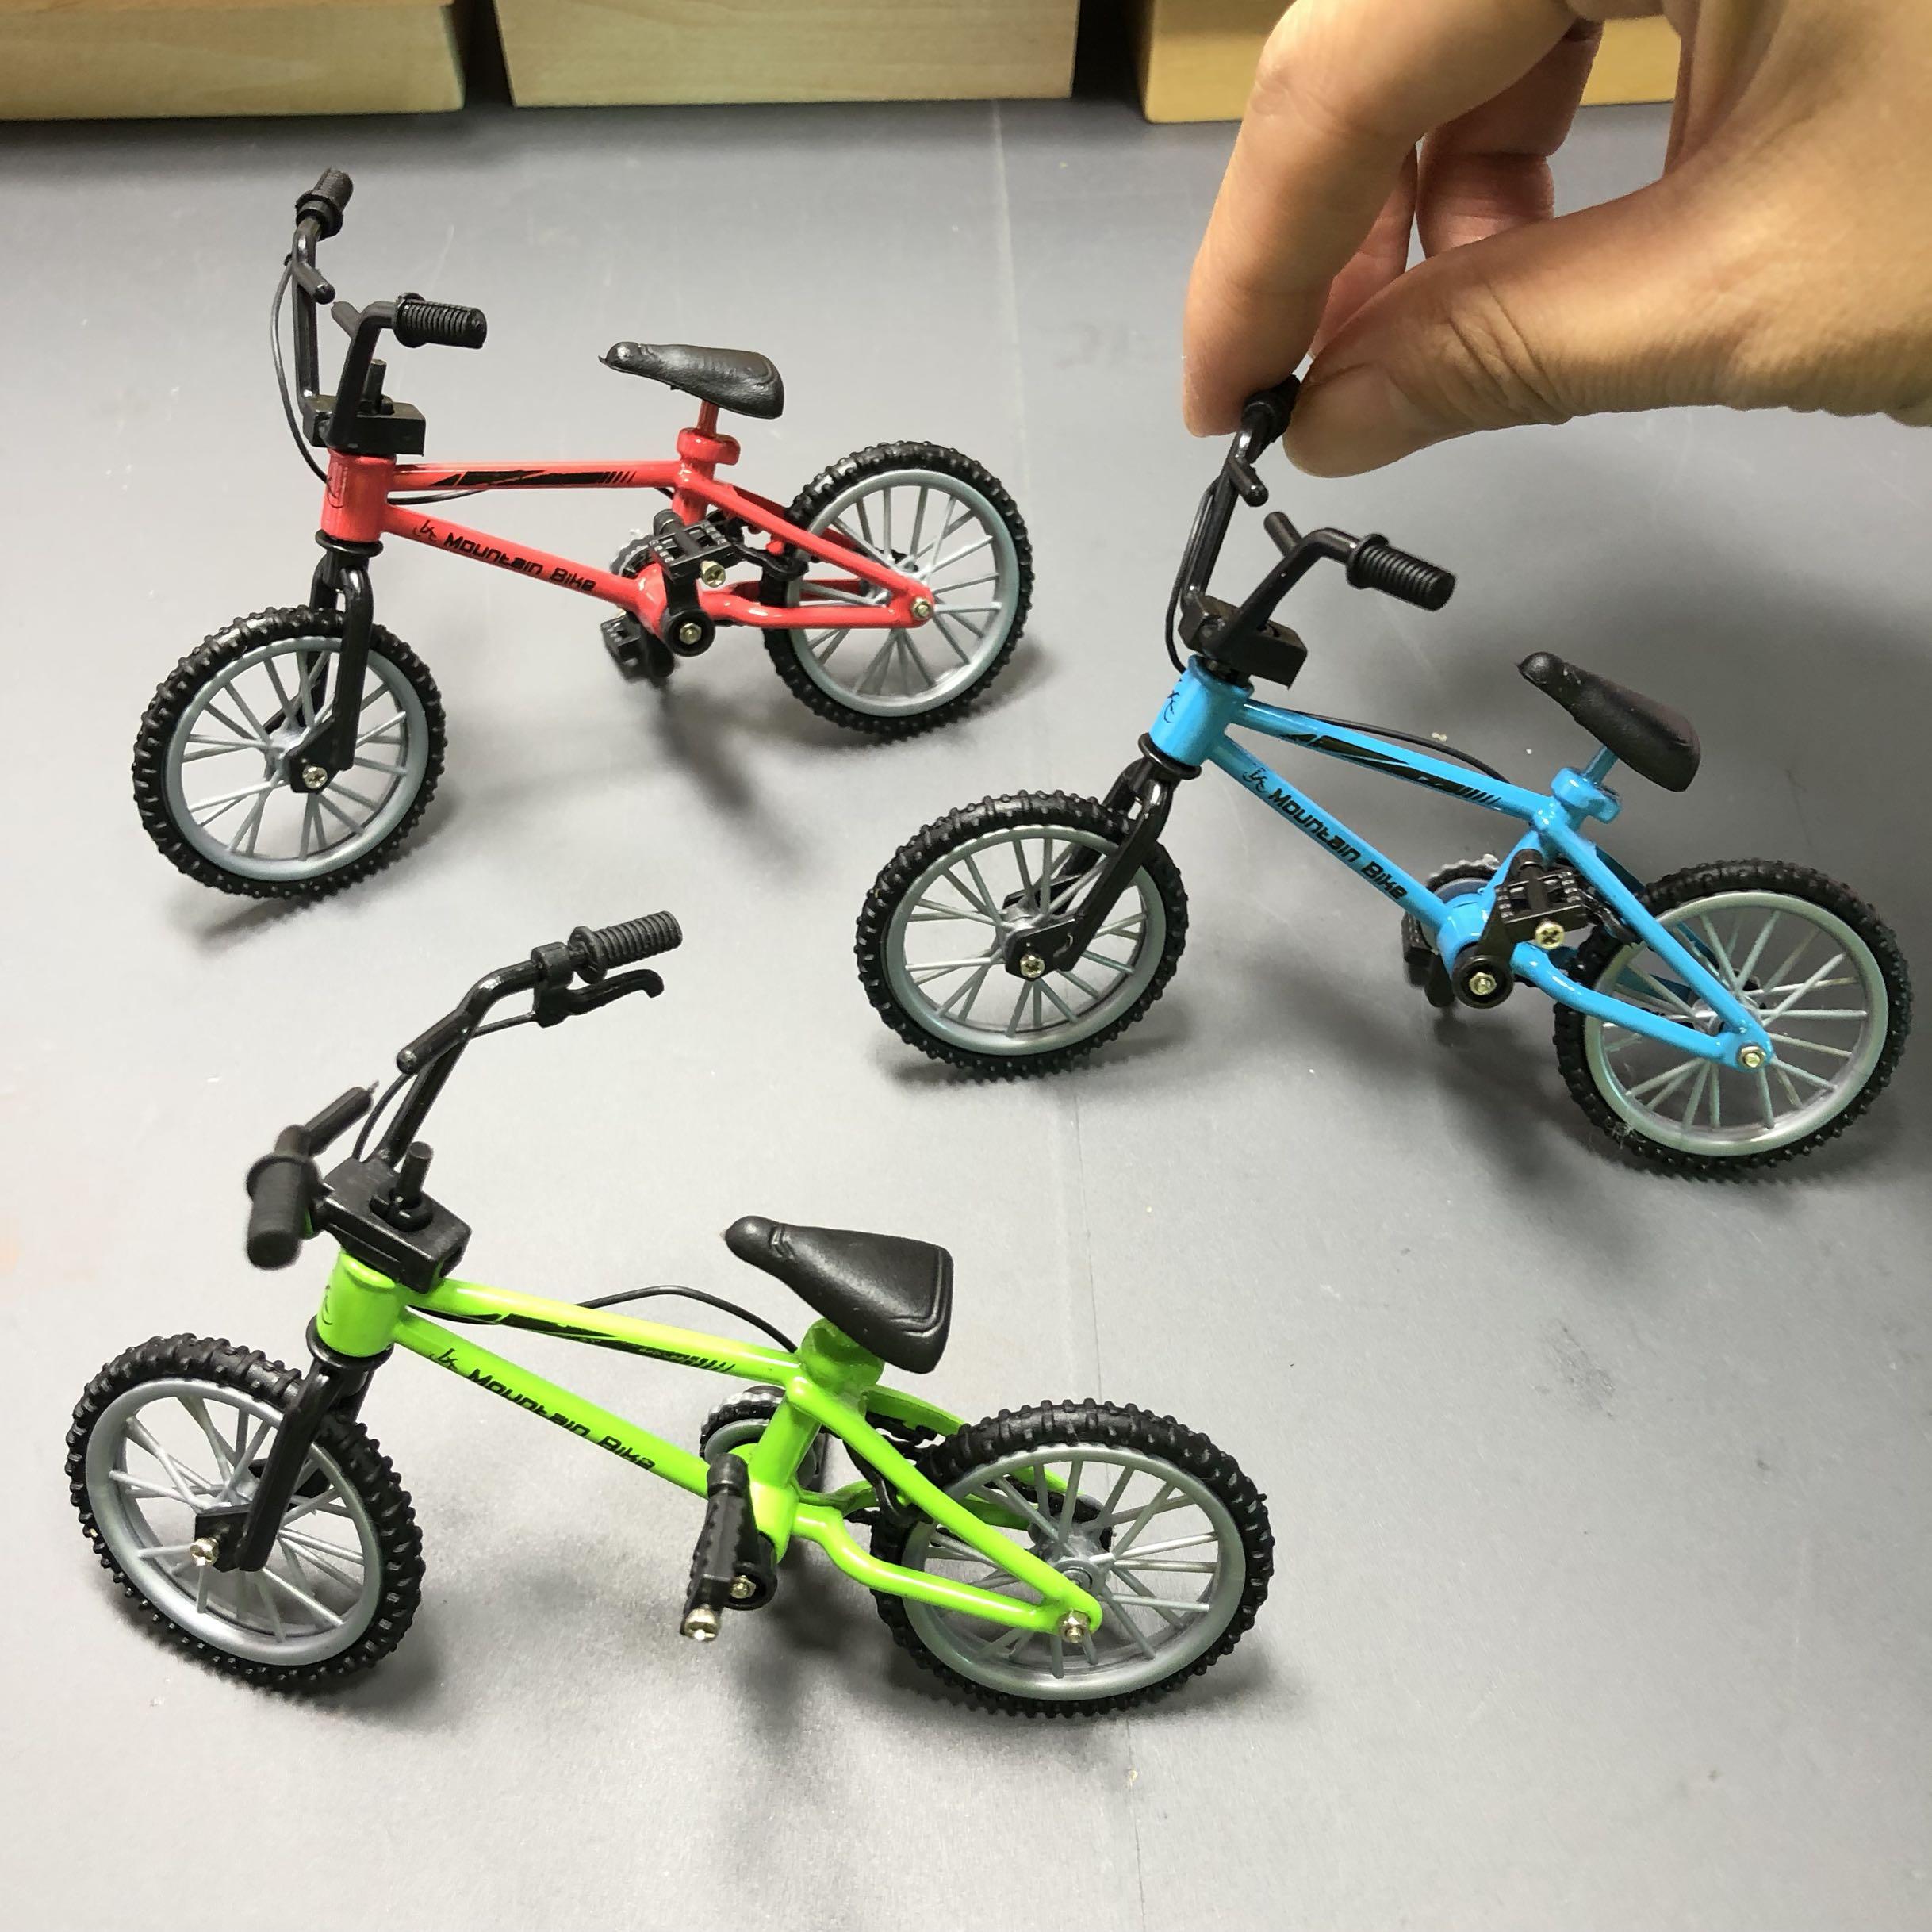 Creative Model Simulation Mini Alloy Bike Cake Decoration 1:18 Finger Bike Model Mountain Bike